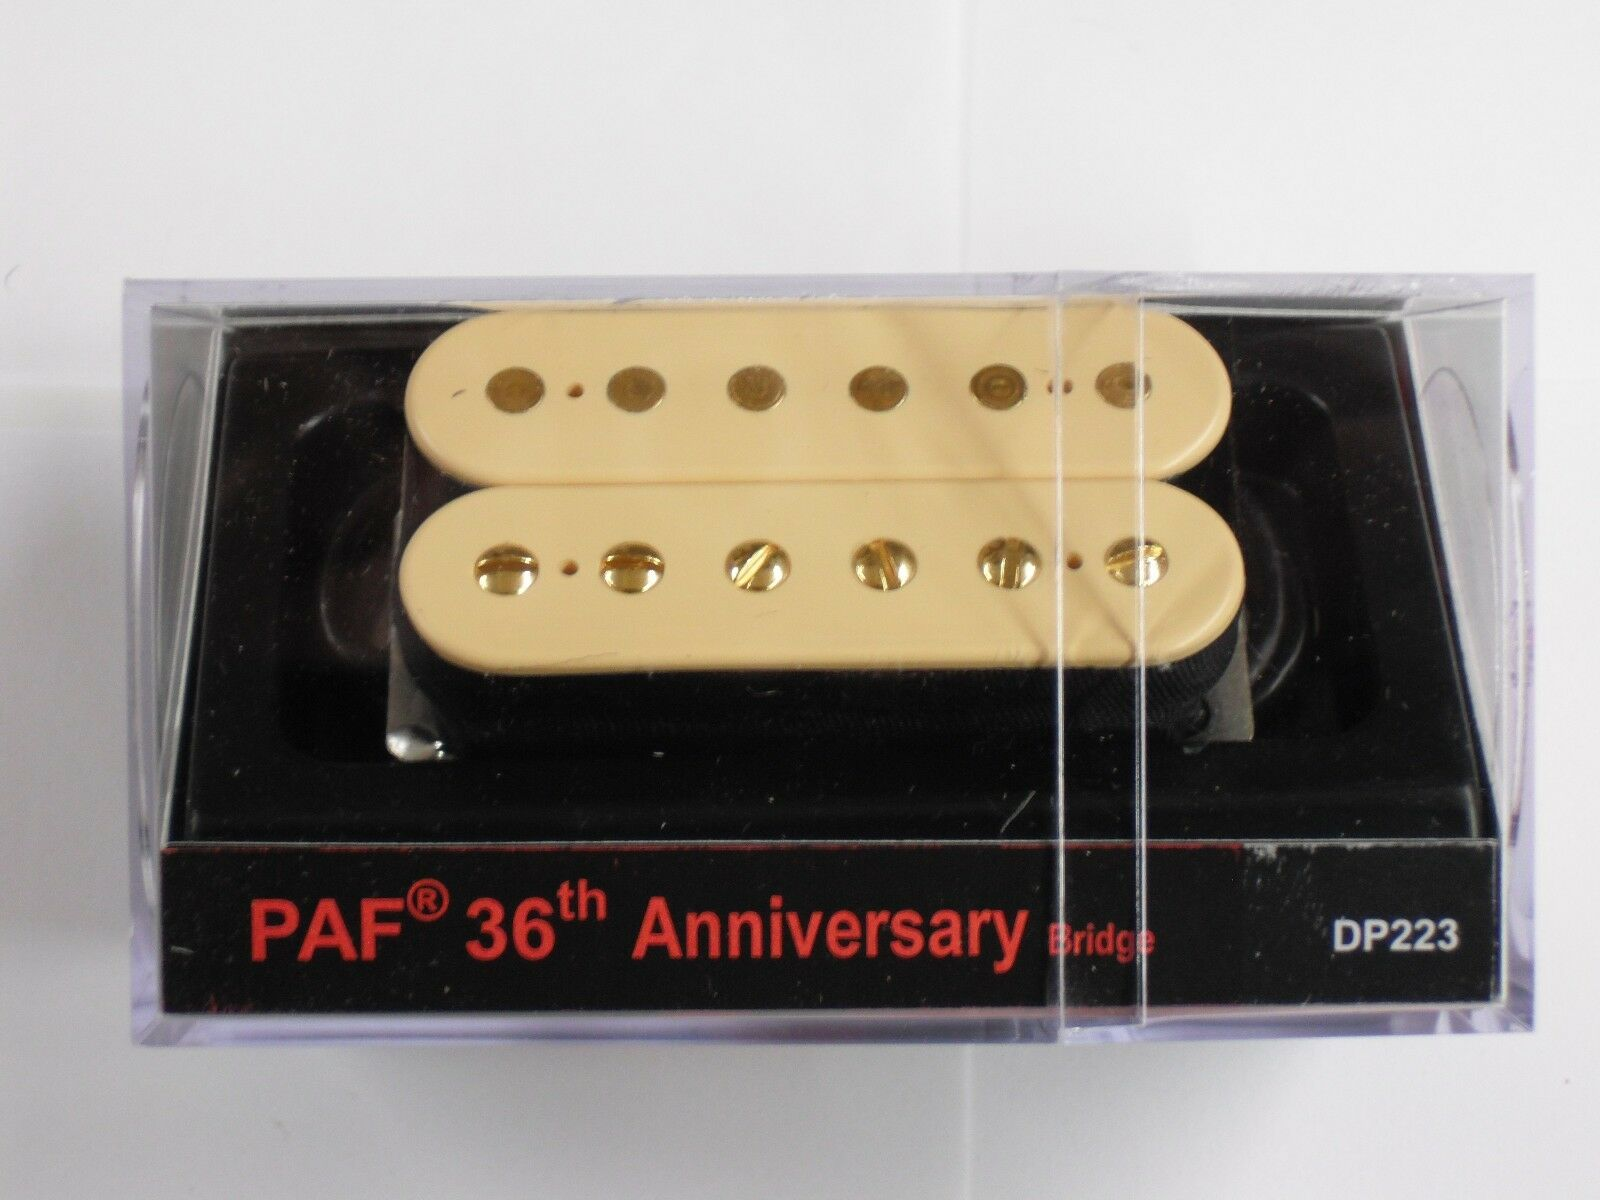 DiMarzio Regular Spaced PAF 36th ANNIVERSARY Bridge Creme W Gold Poles DP 223